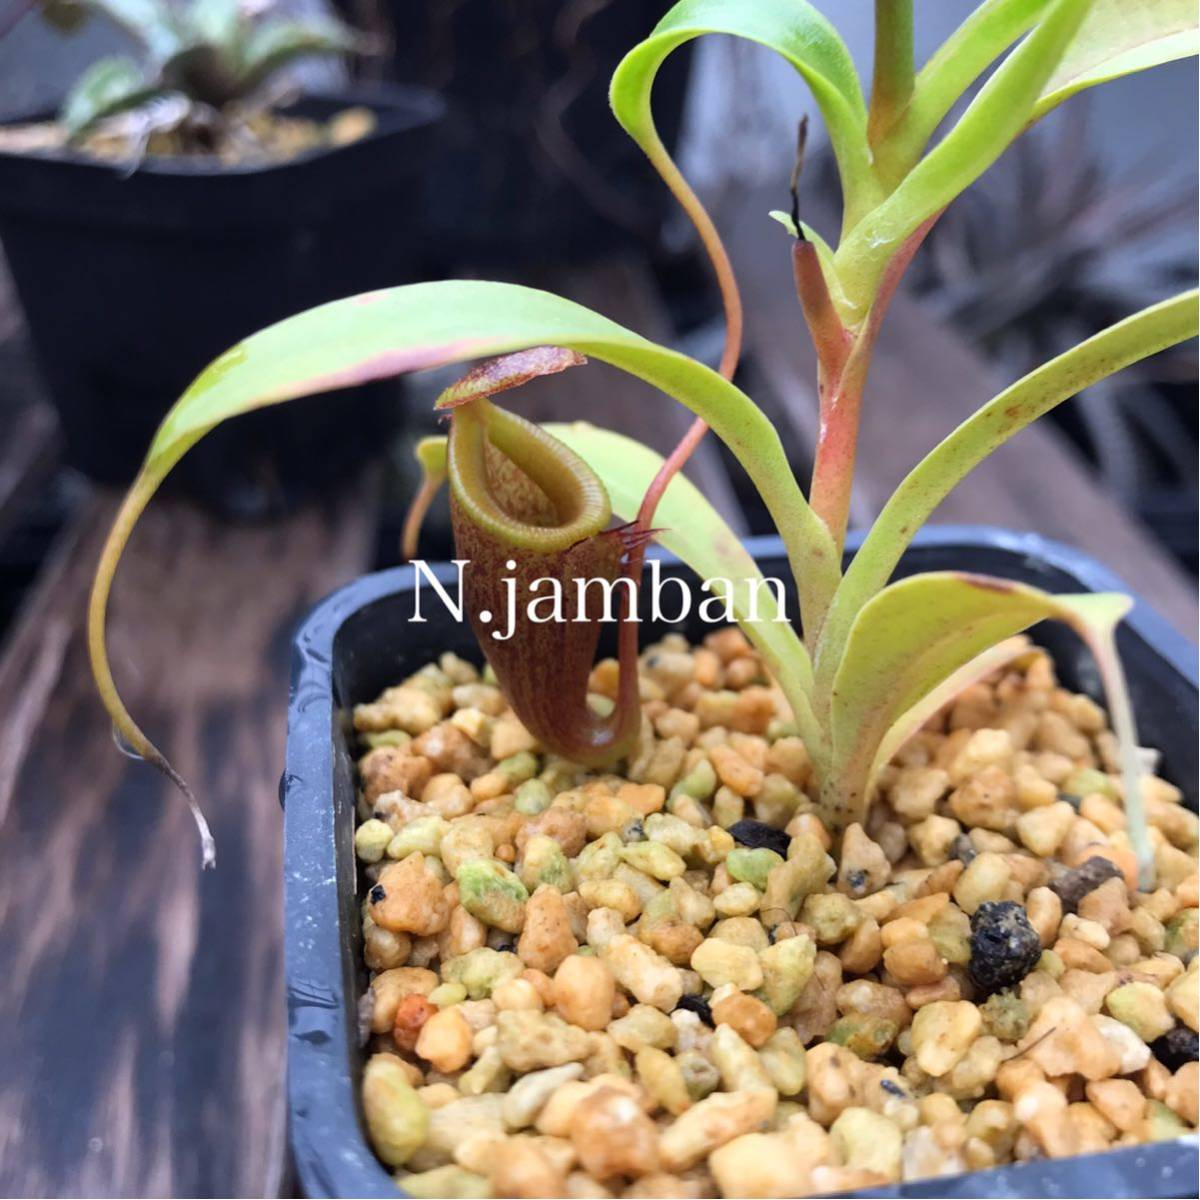 Nepenthes jamban No1 ウツボカズラ 食虫植物 ネペンテス